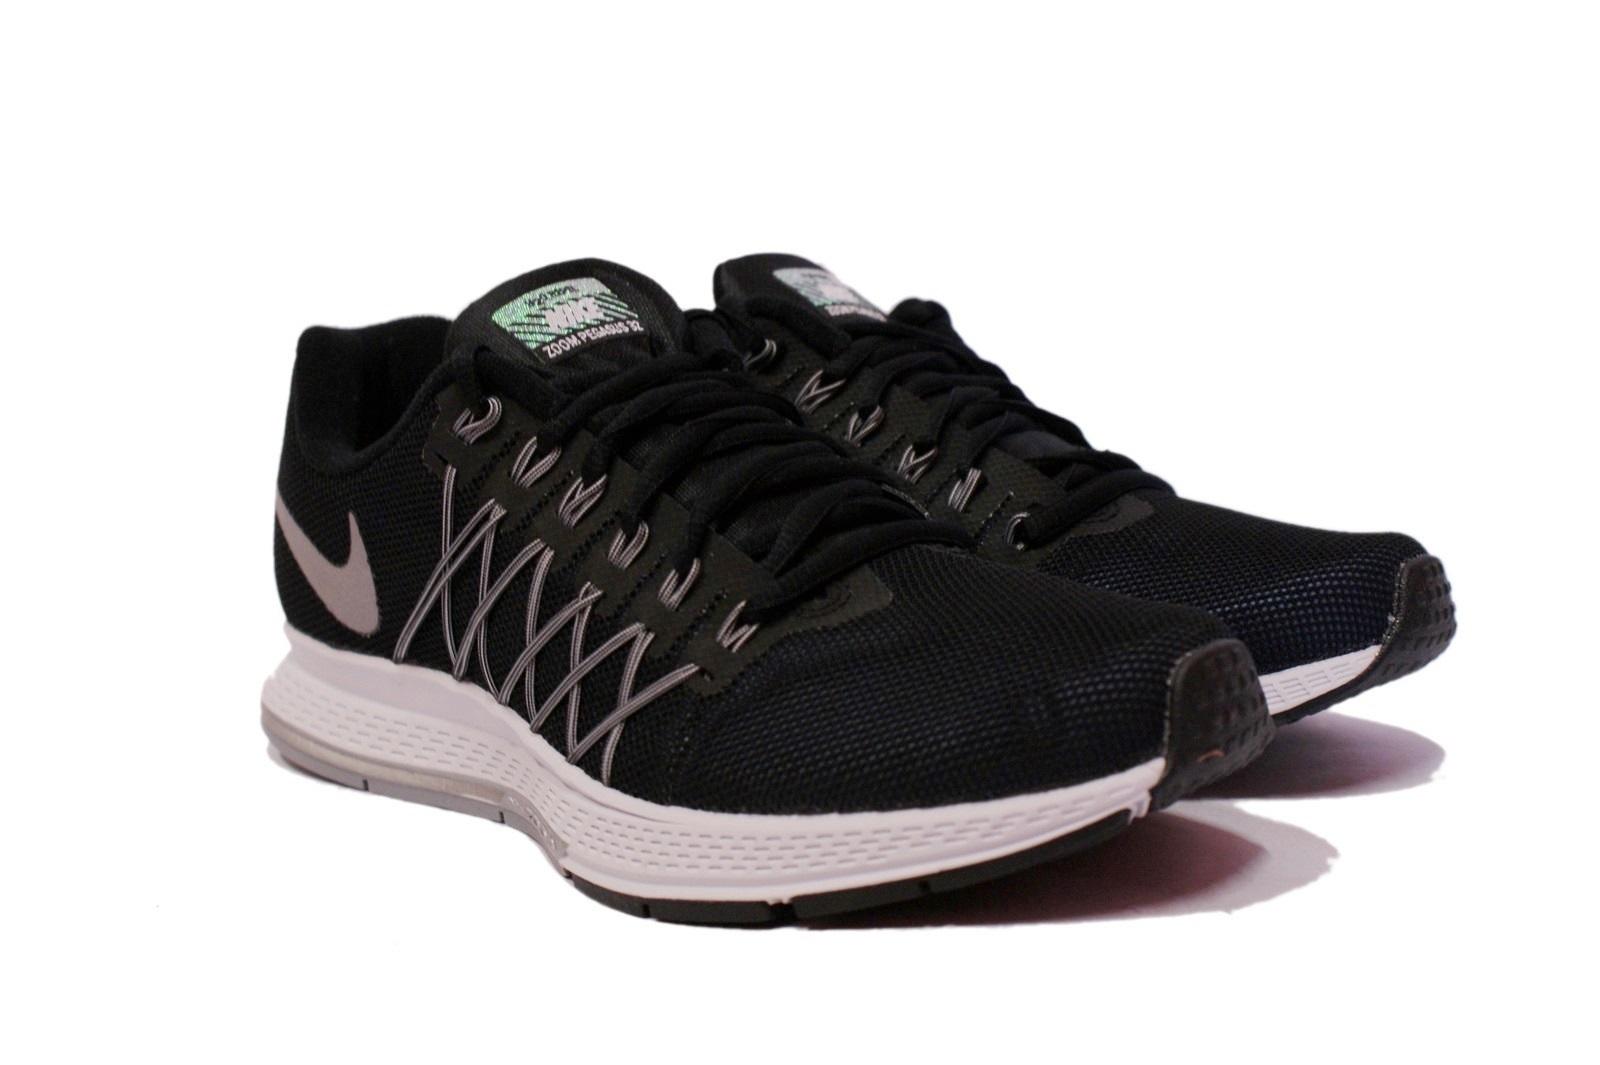 Odblaskowe 7449409762 40 Buty Zoom Flash Nike 32 Pegasus Air